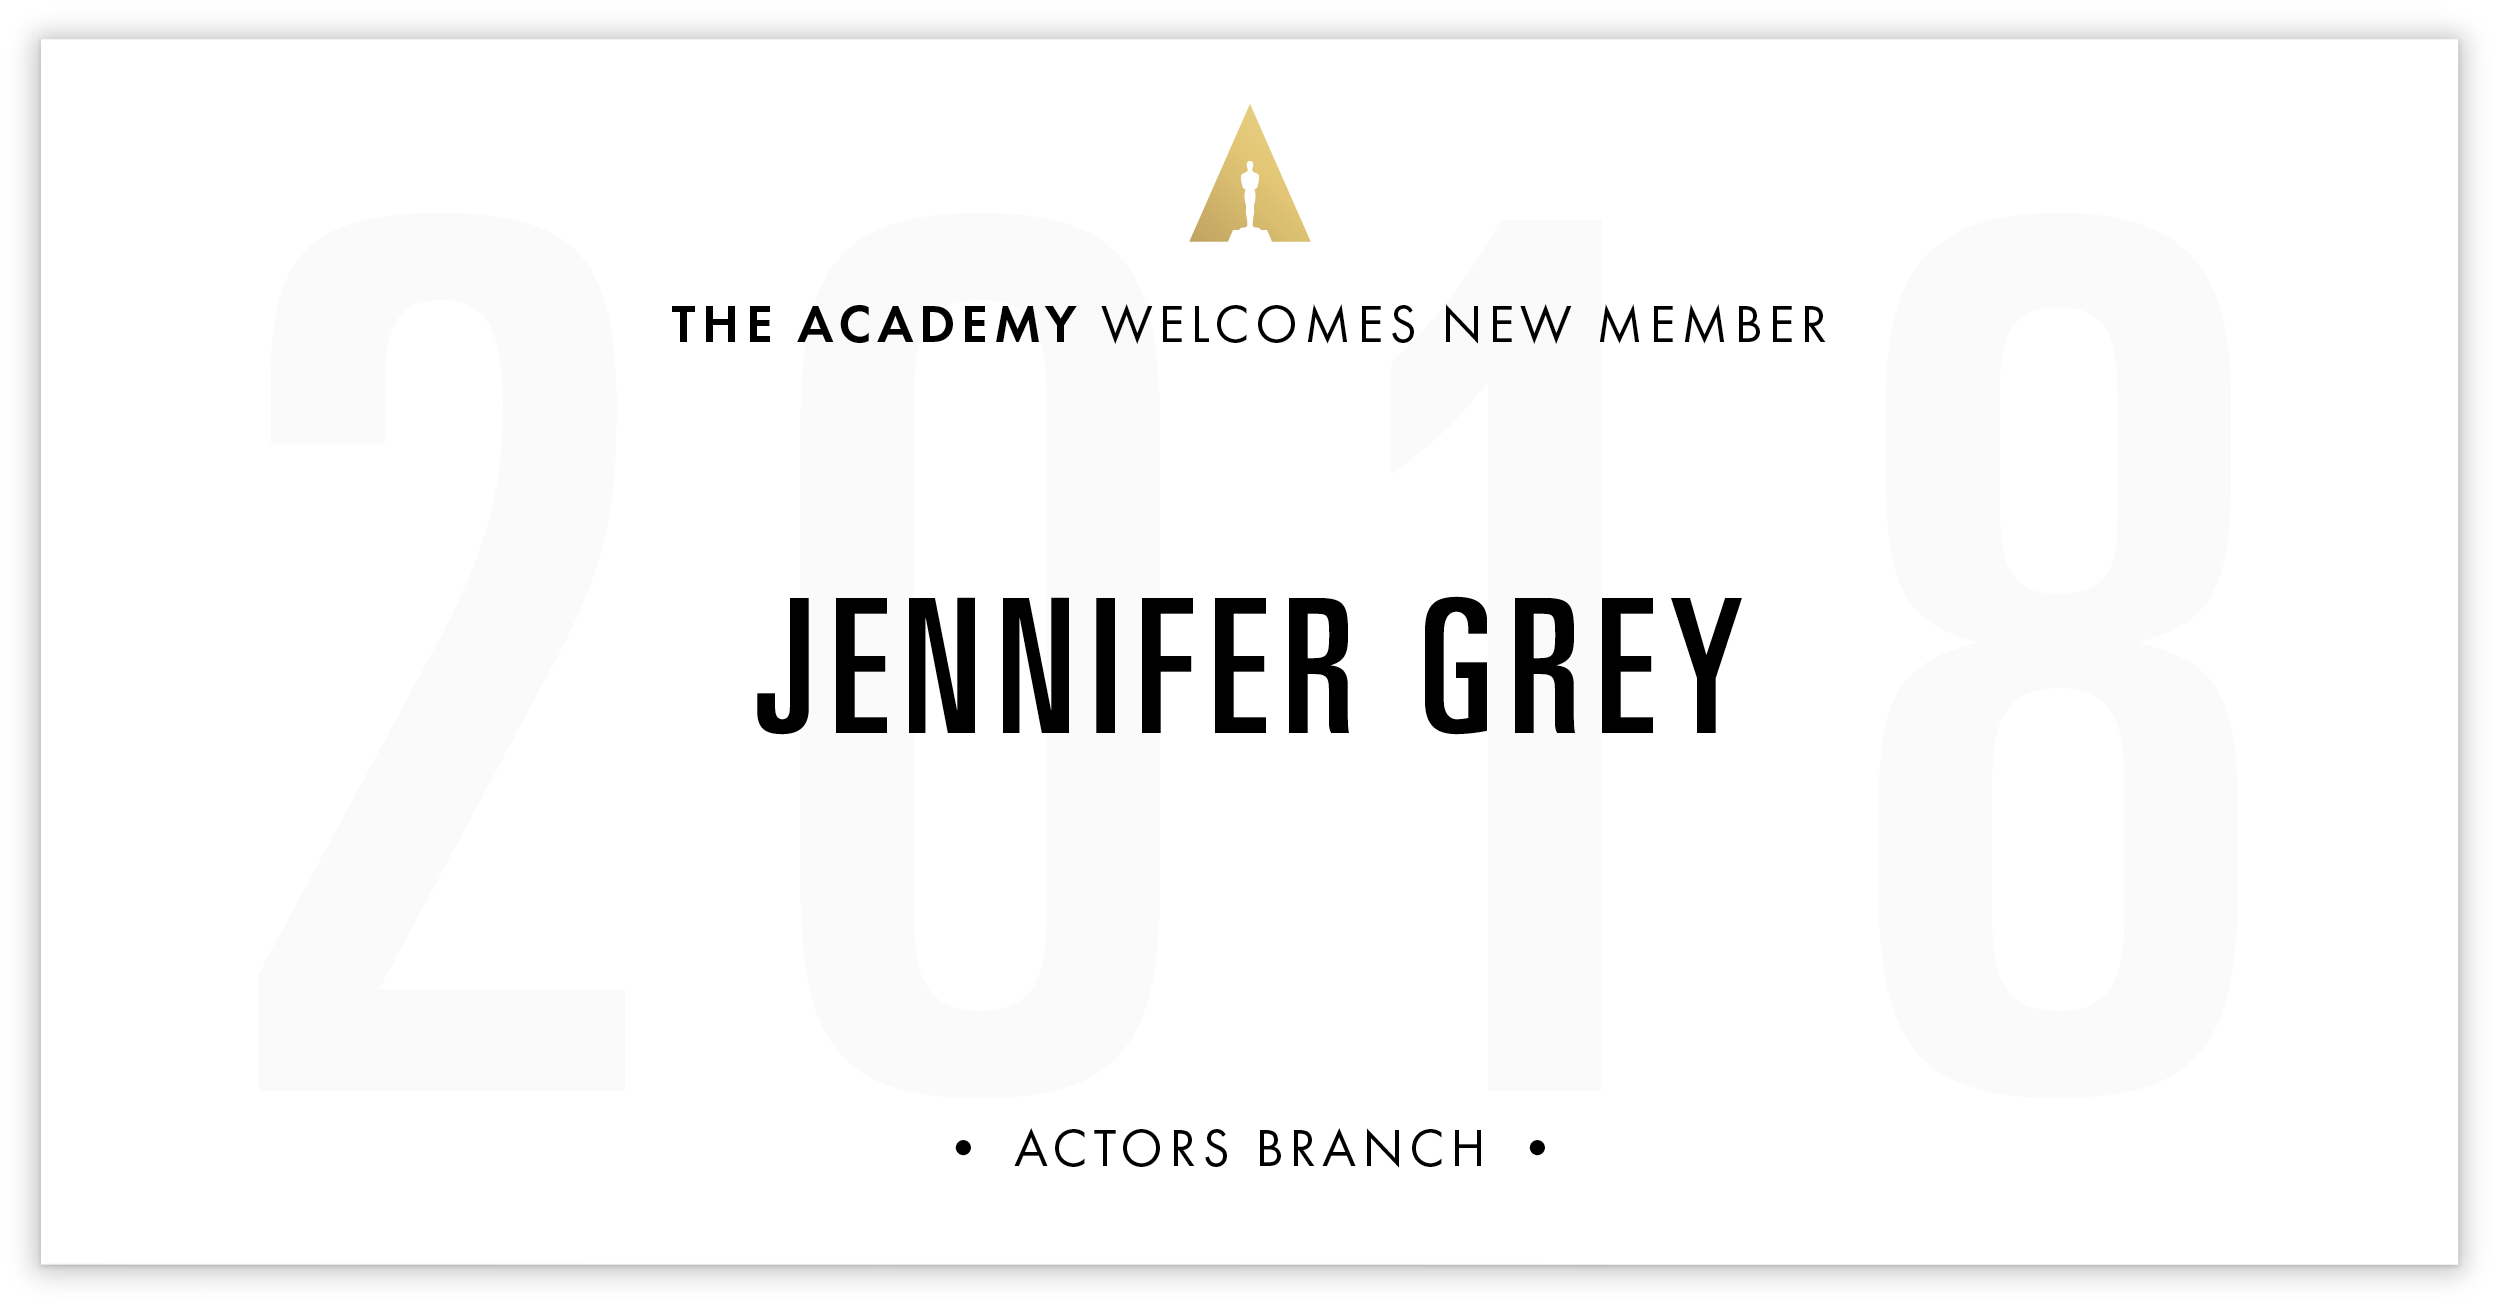 Jennifer Grey is invited!